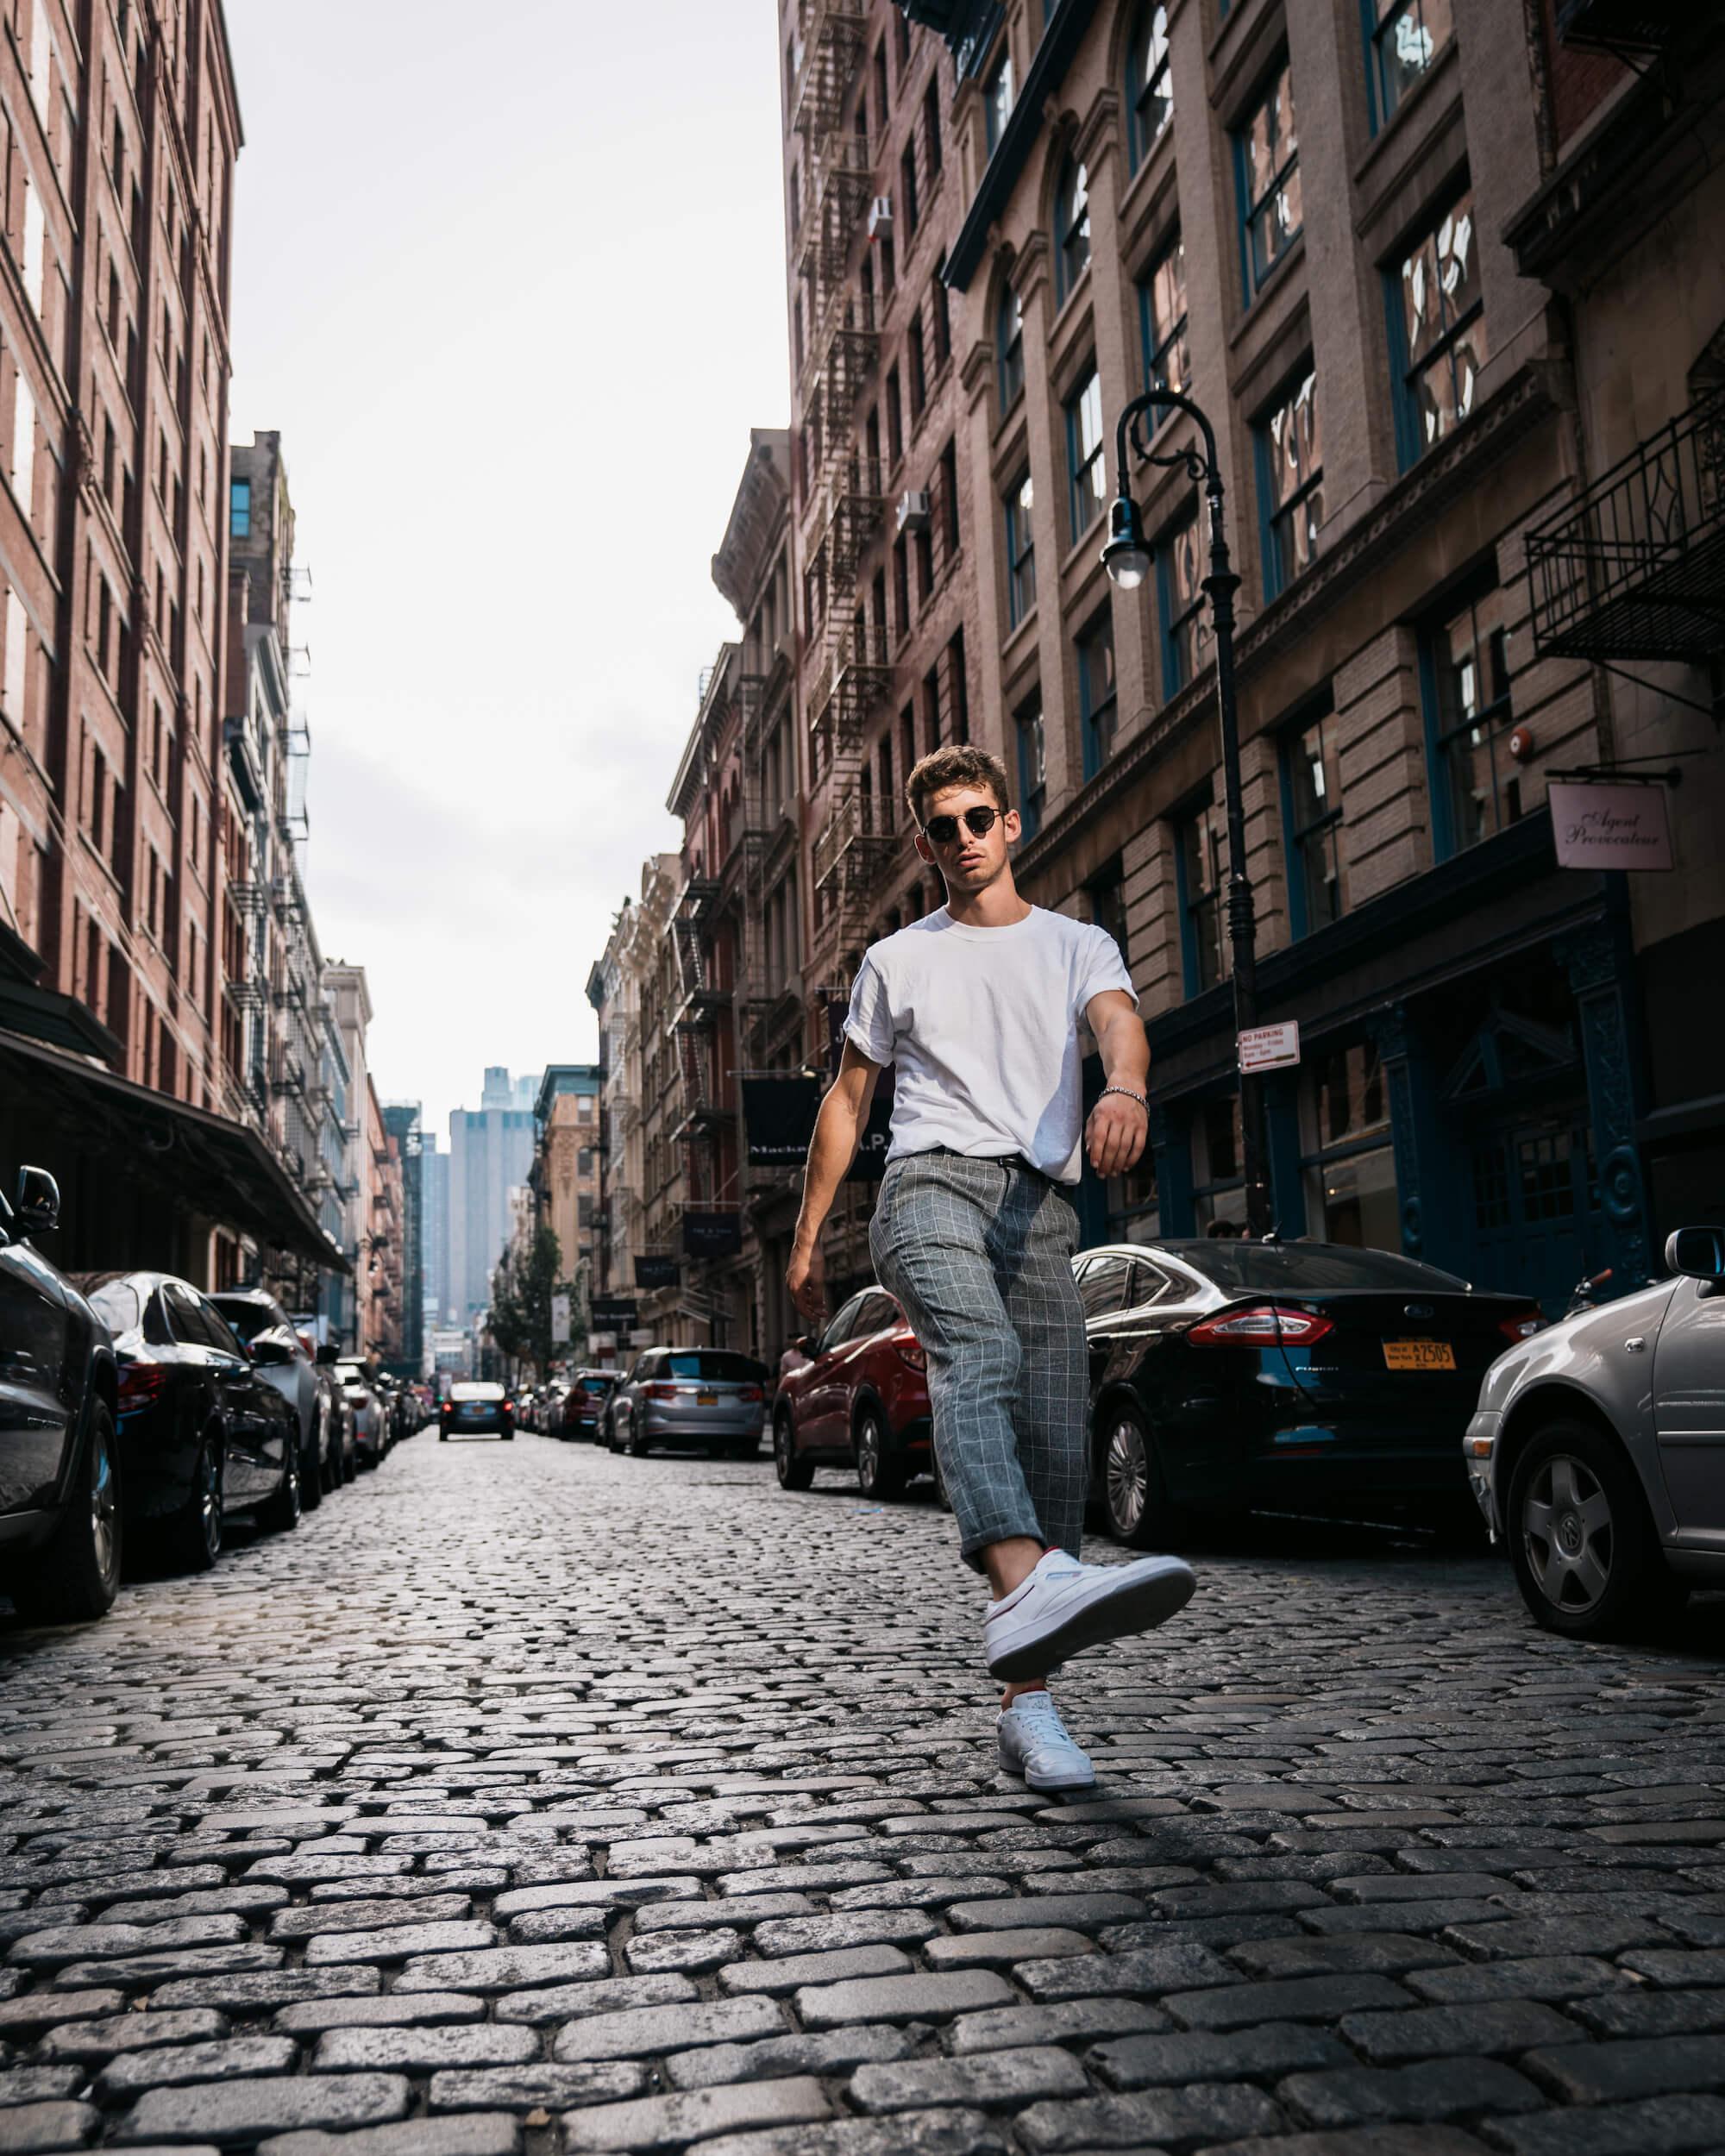 joey NYC kick.jpg